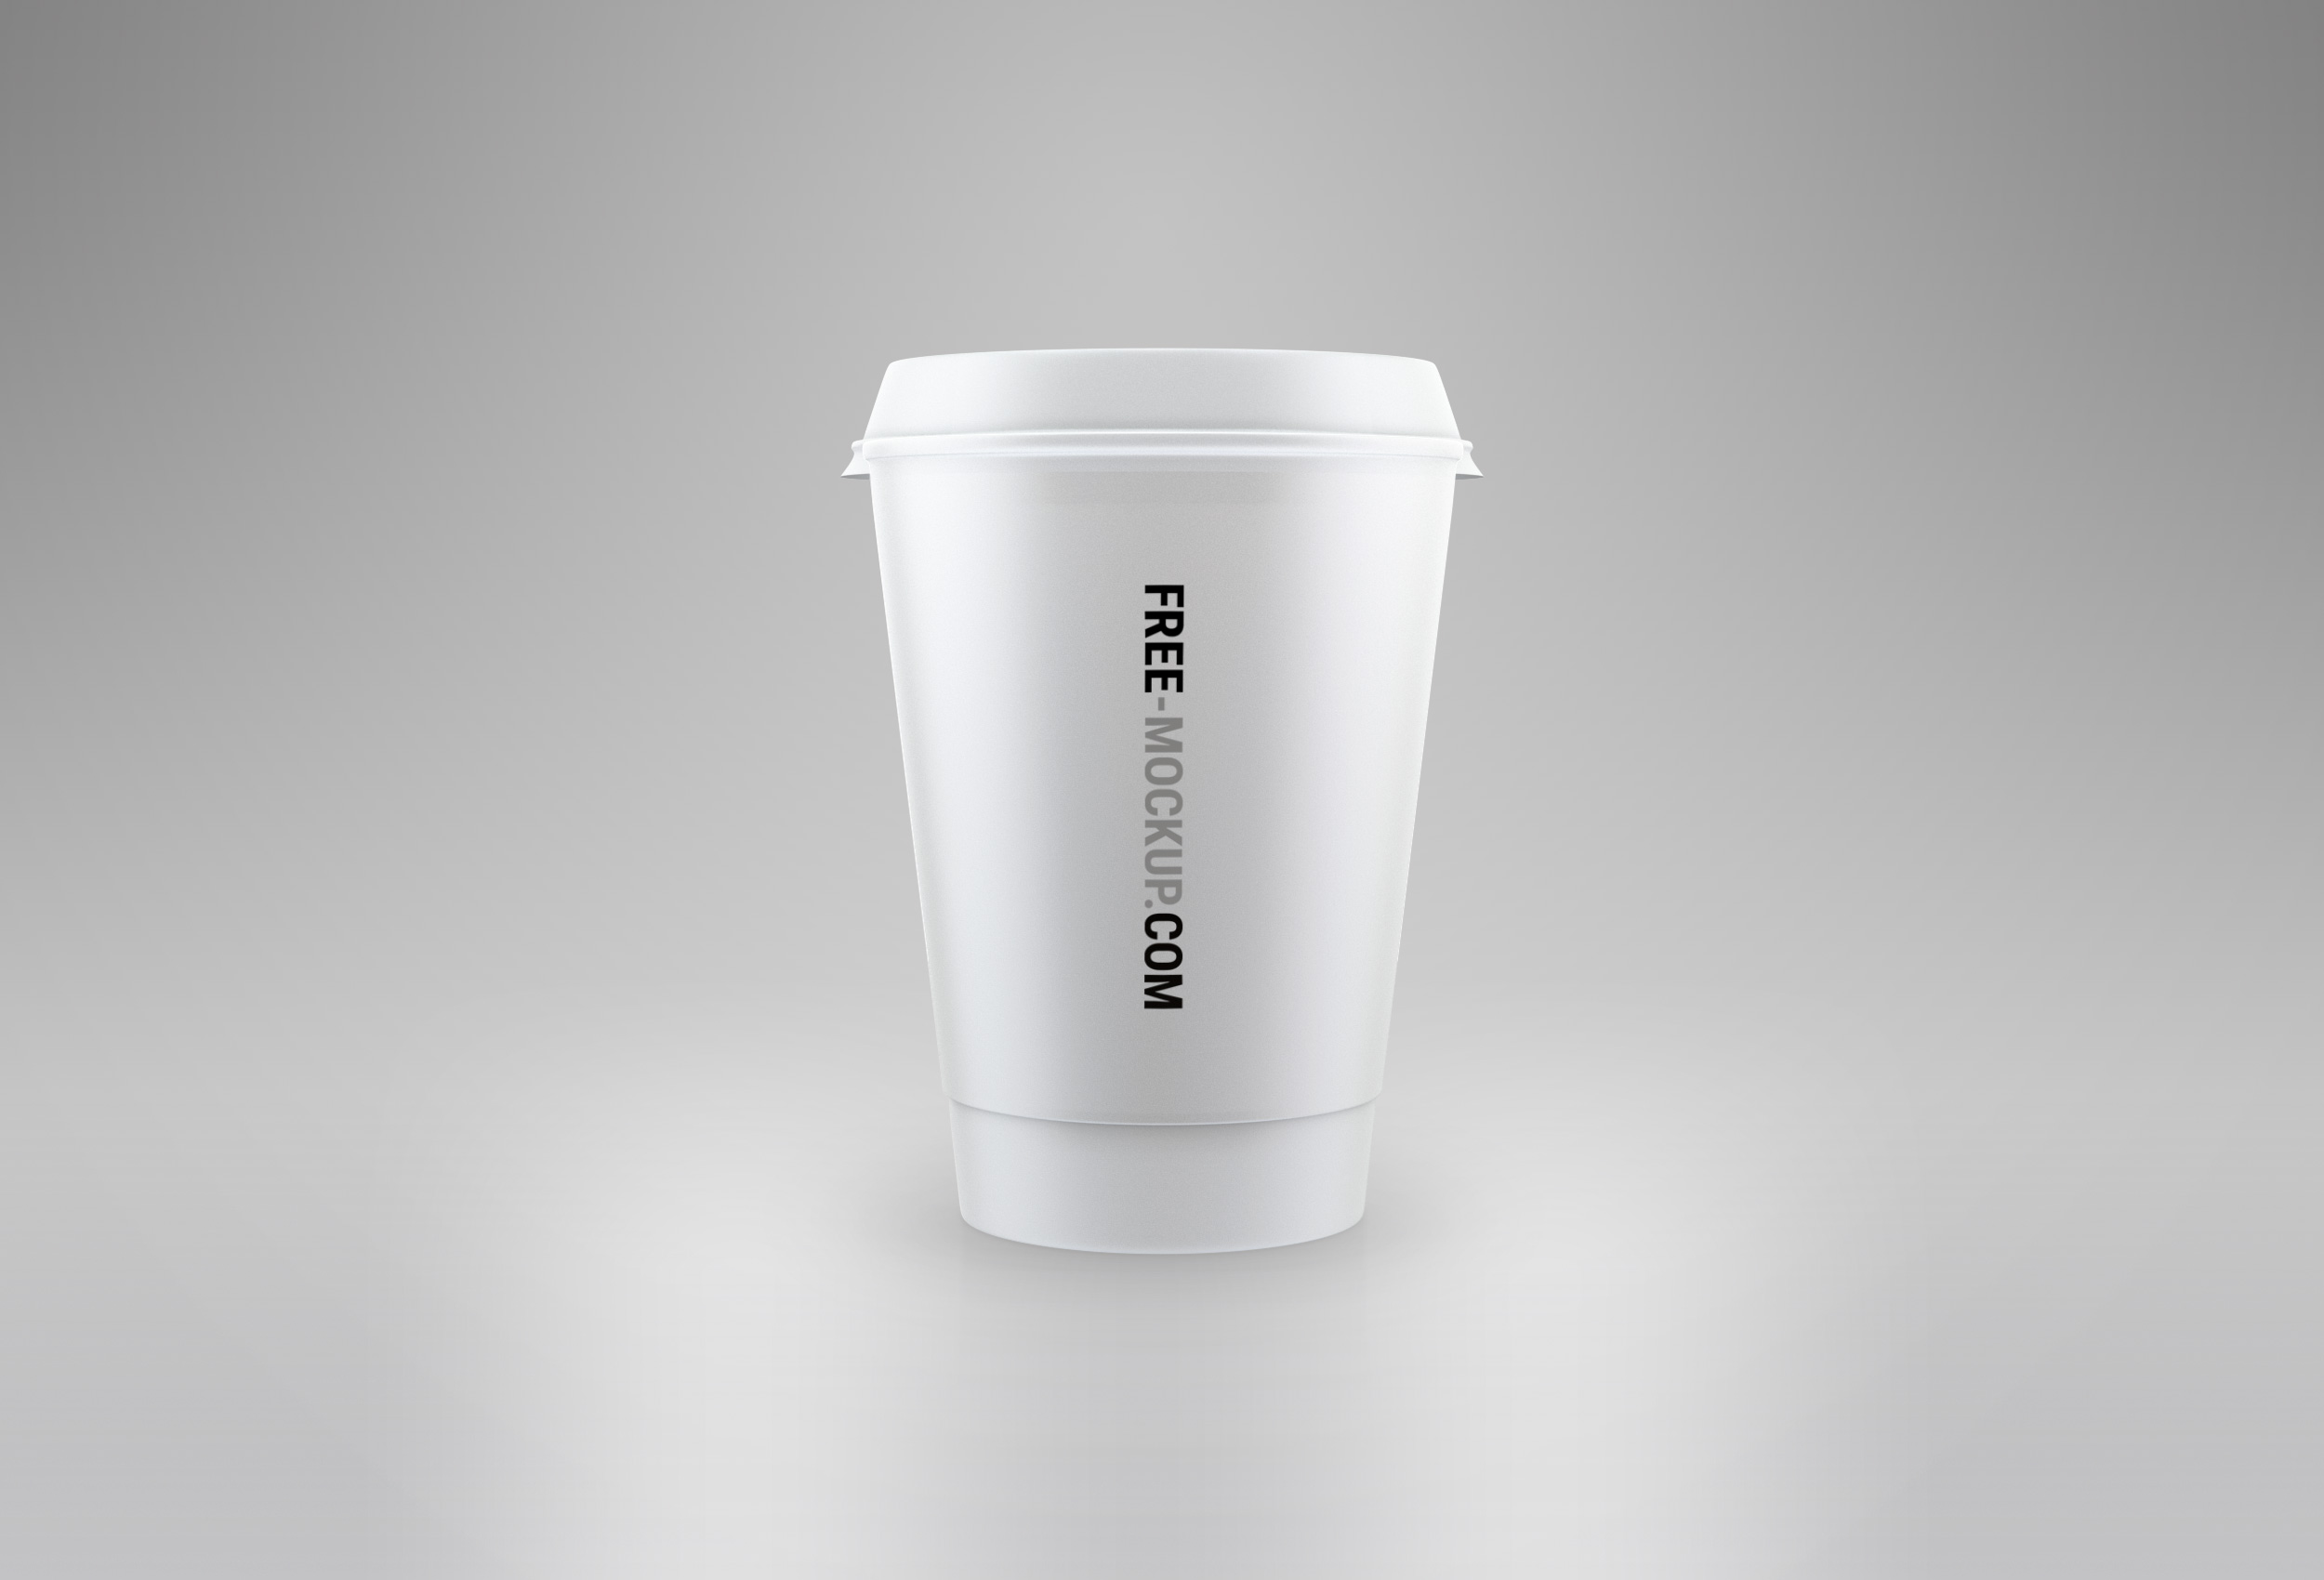 Starbucks Coffe Cup Style Mockup Free Mockup